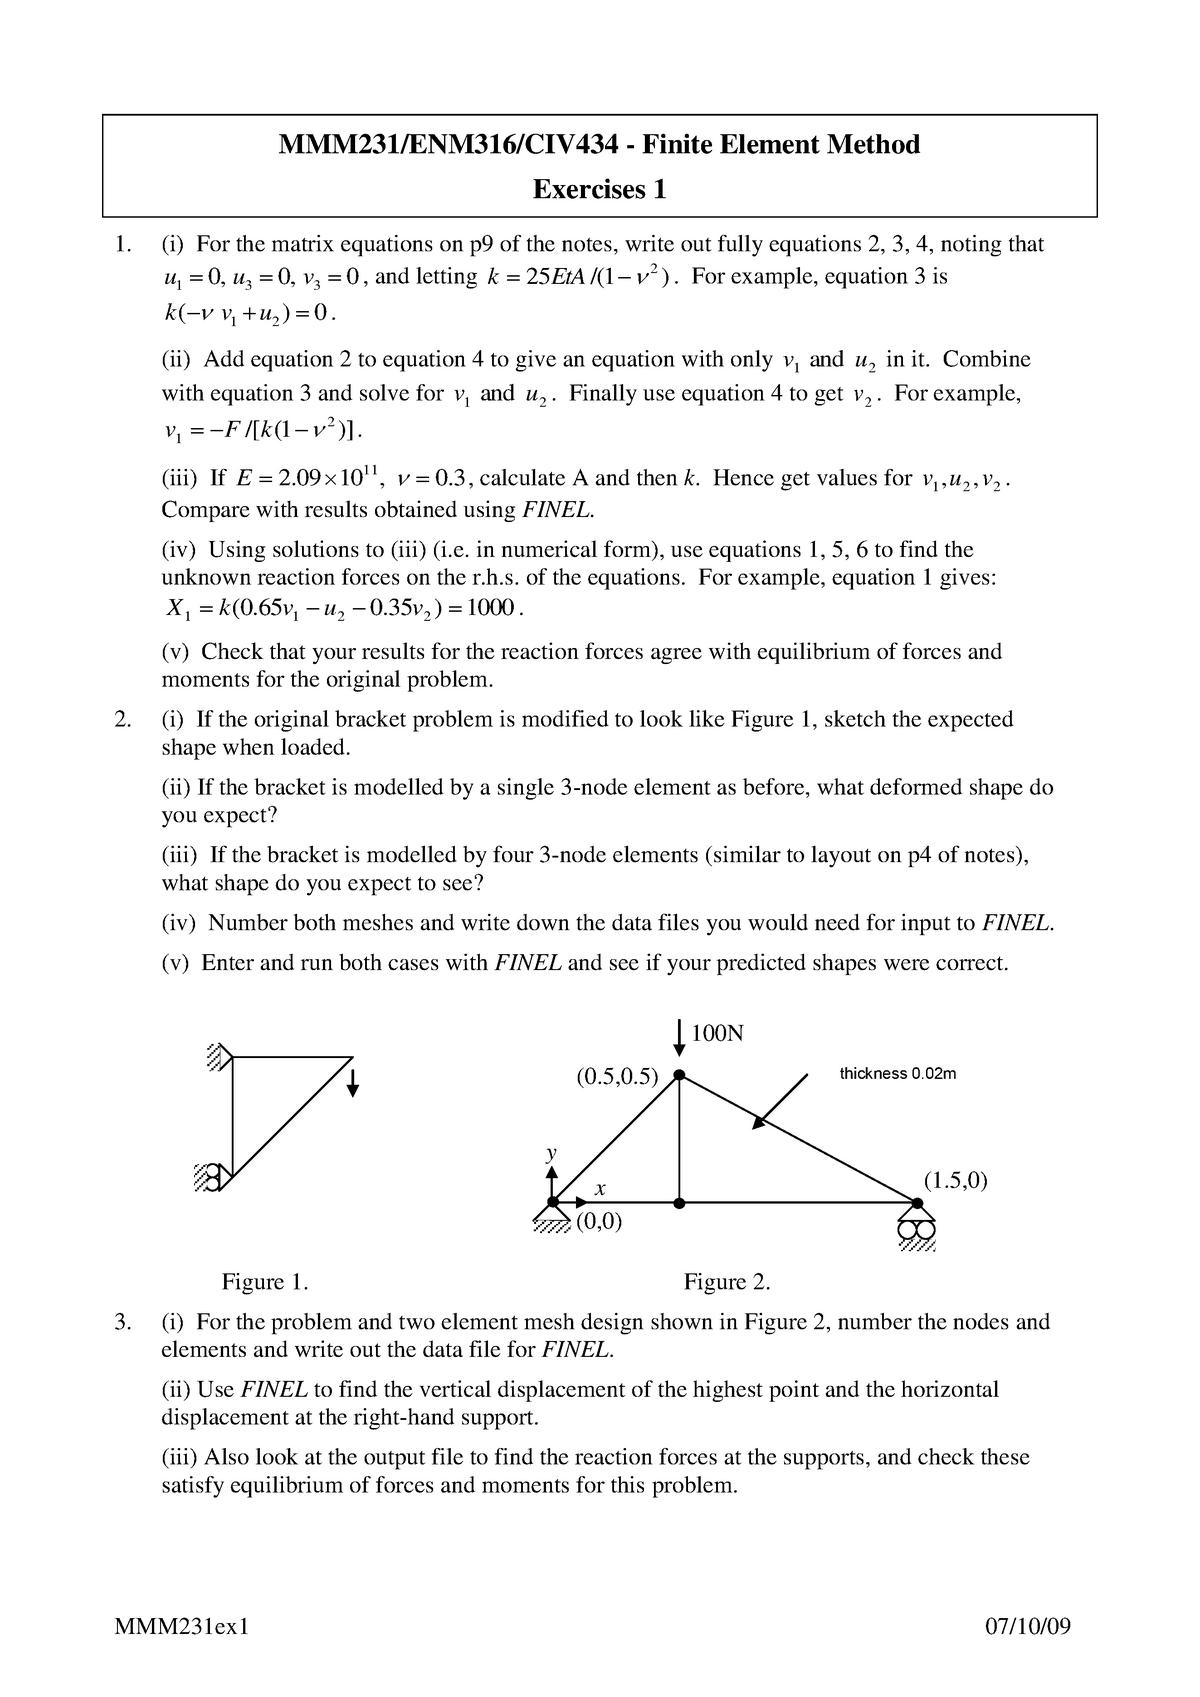 Finite Element Method- Exercises 1 - MMM231/ENM316/CIV434